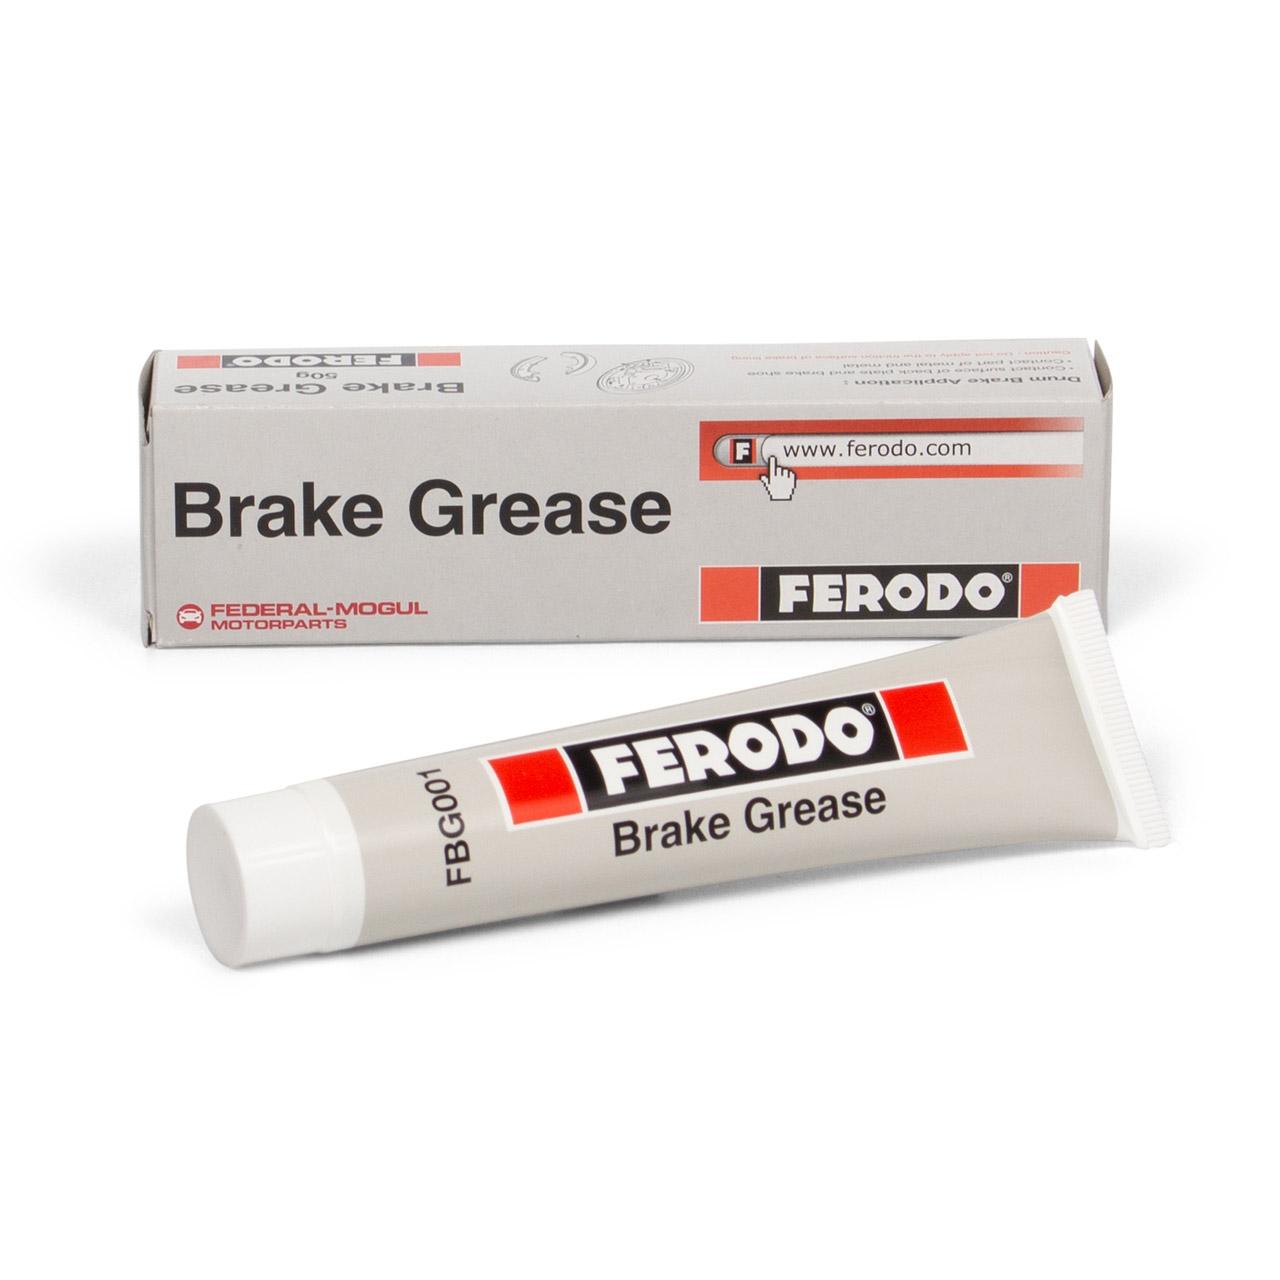 FERODO FBG001 BRAKE GREASE Bremsklotzpaste Bremsbelagpaste Montagepaste 75ml